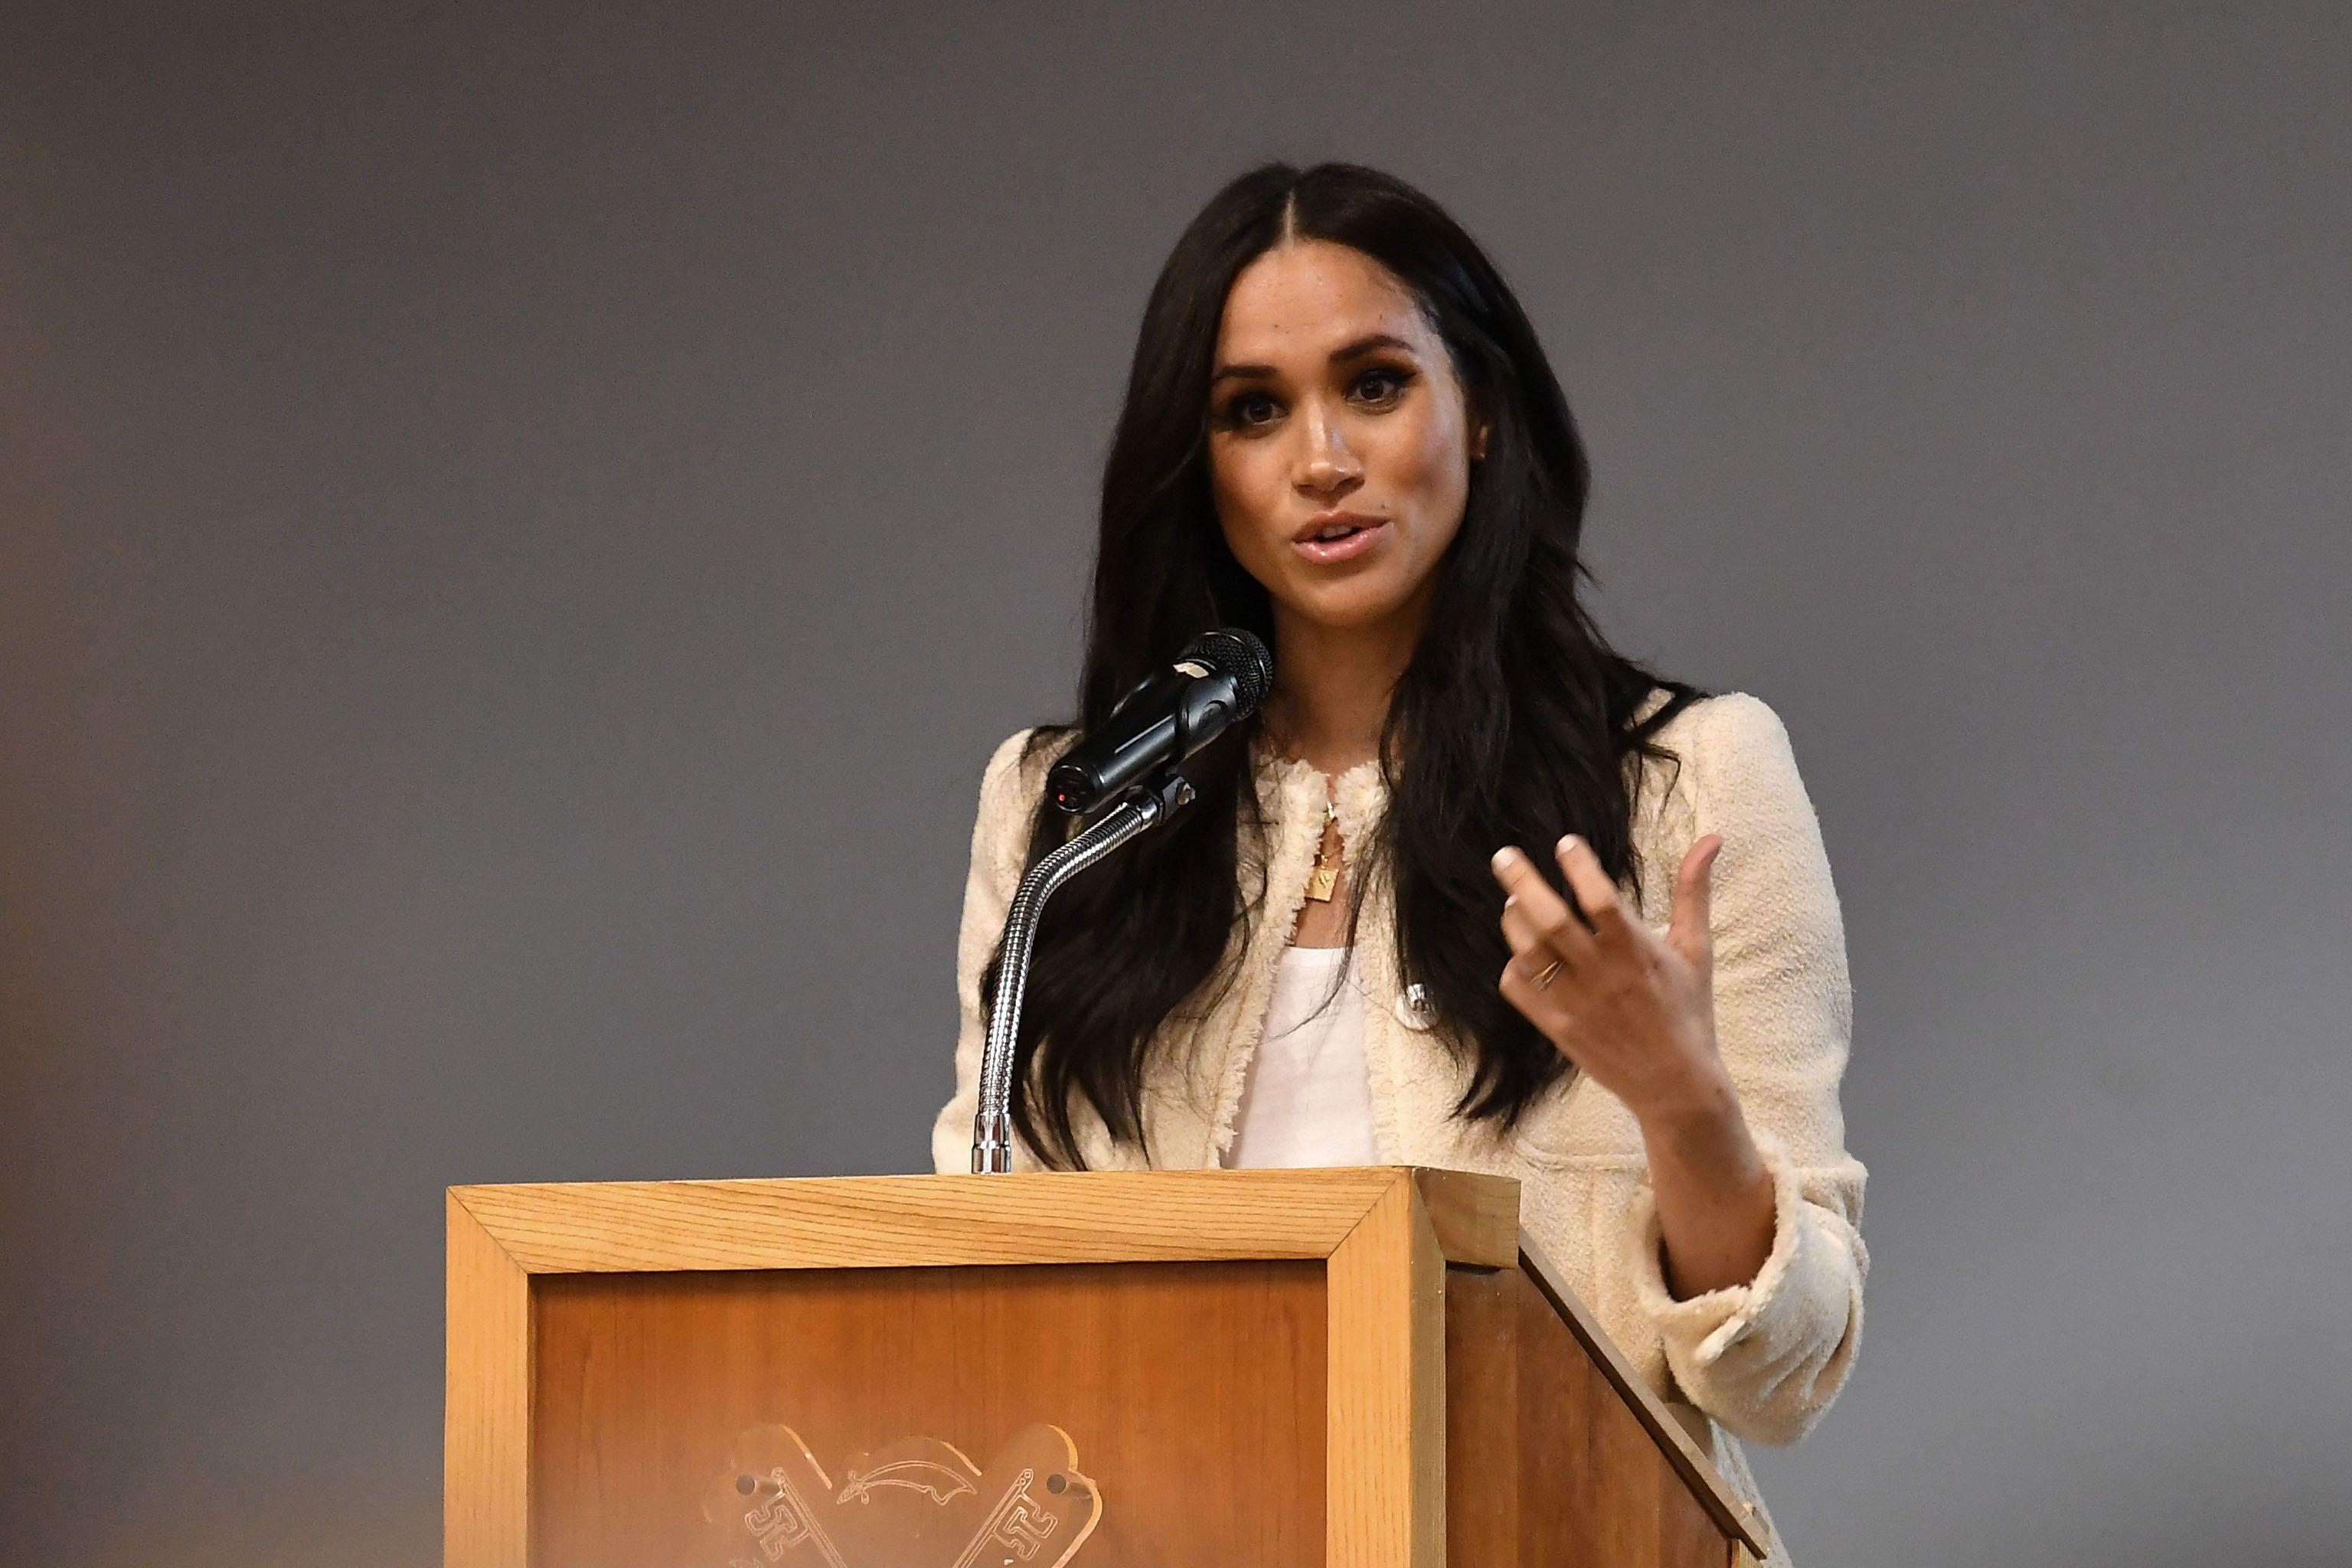 Meghan Markle giving a speech at a podium